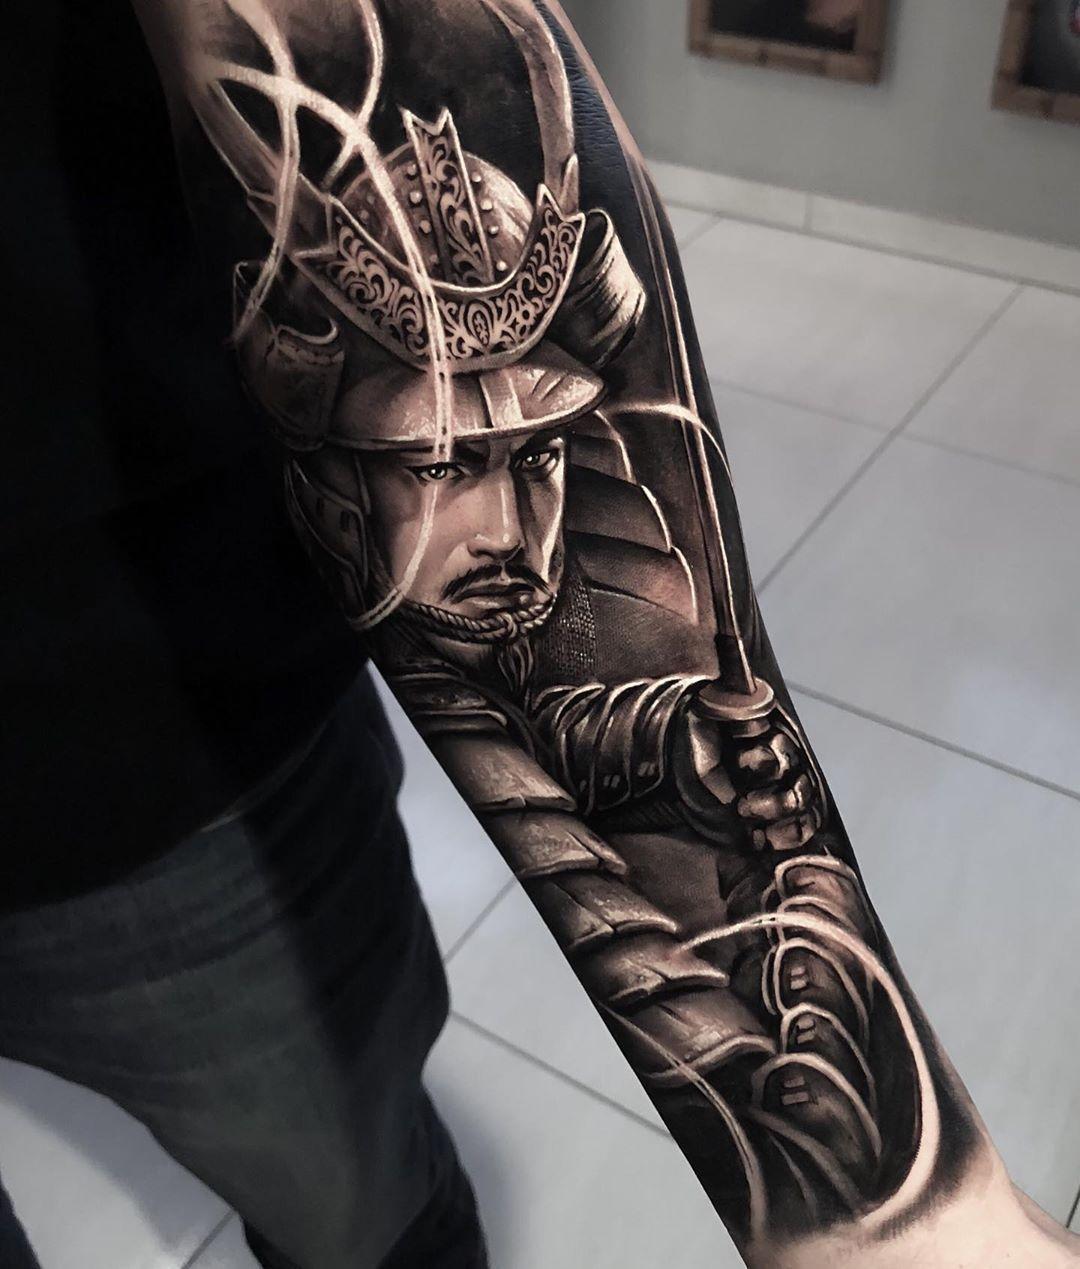 Tattoo Artist Samurai Standoff Samuraistandoff Tattoo2me Profile Warrior Tattoo Sleeve Samurai Tattoo Design Samurai Tattoo Sleeve